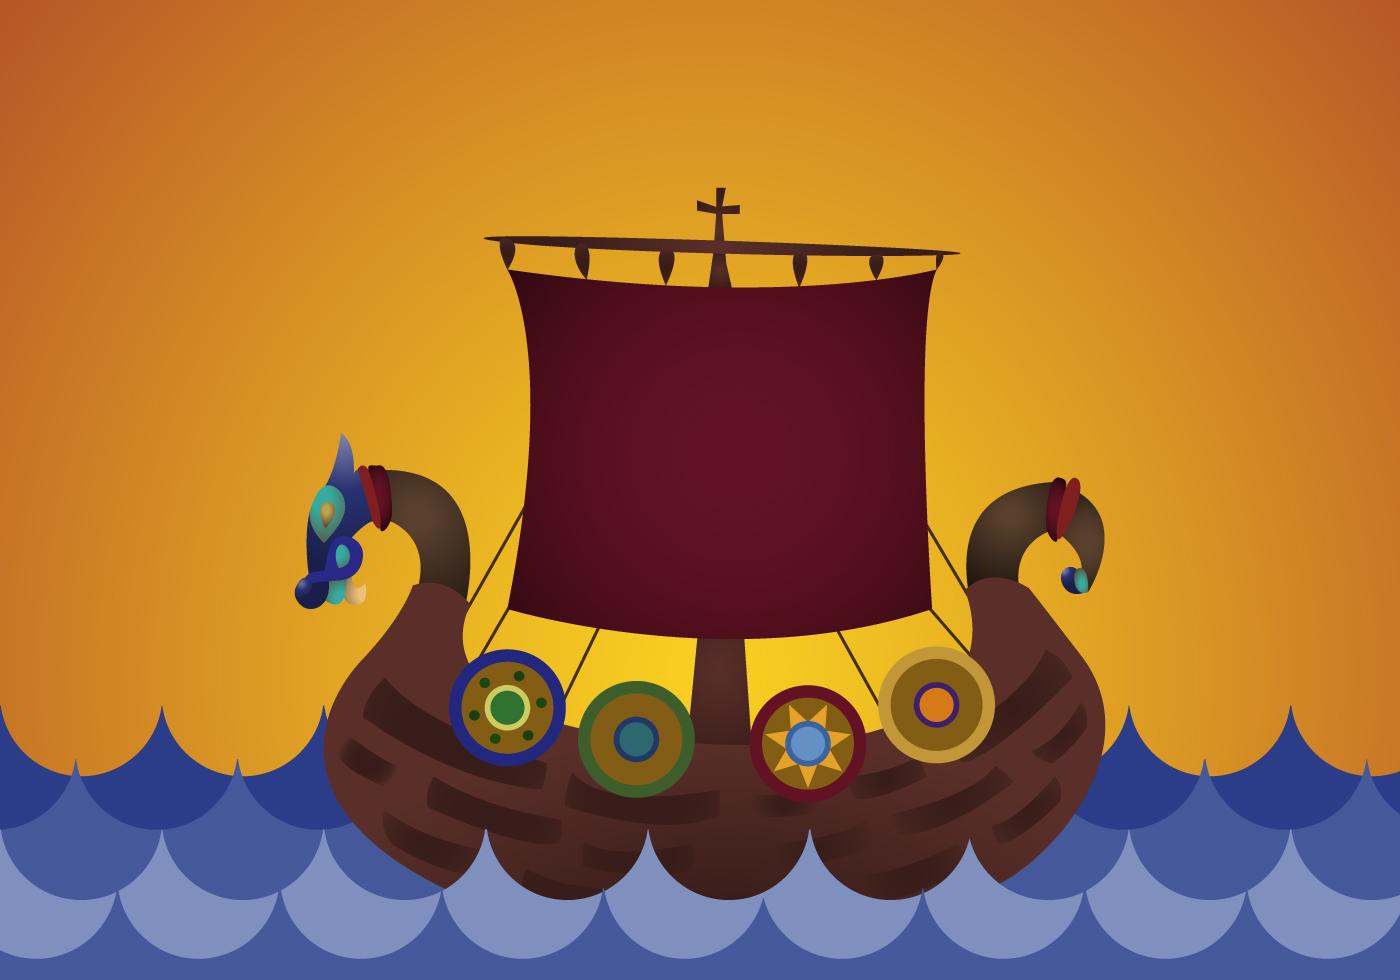 Free Viking Ship Vector - Download Free Vector Art, Stock ...